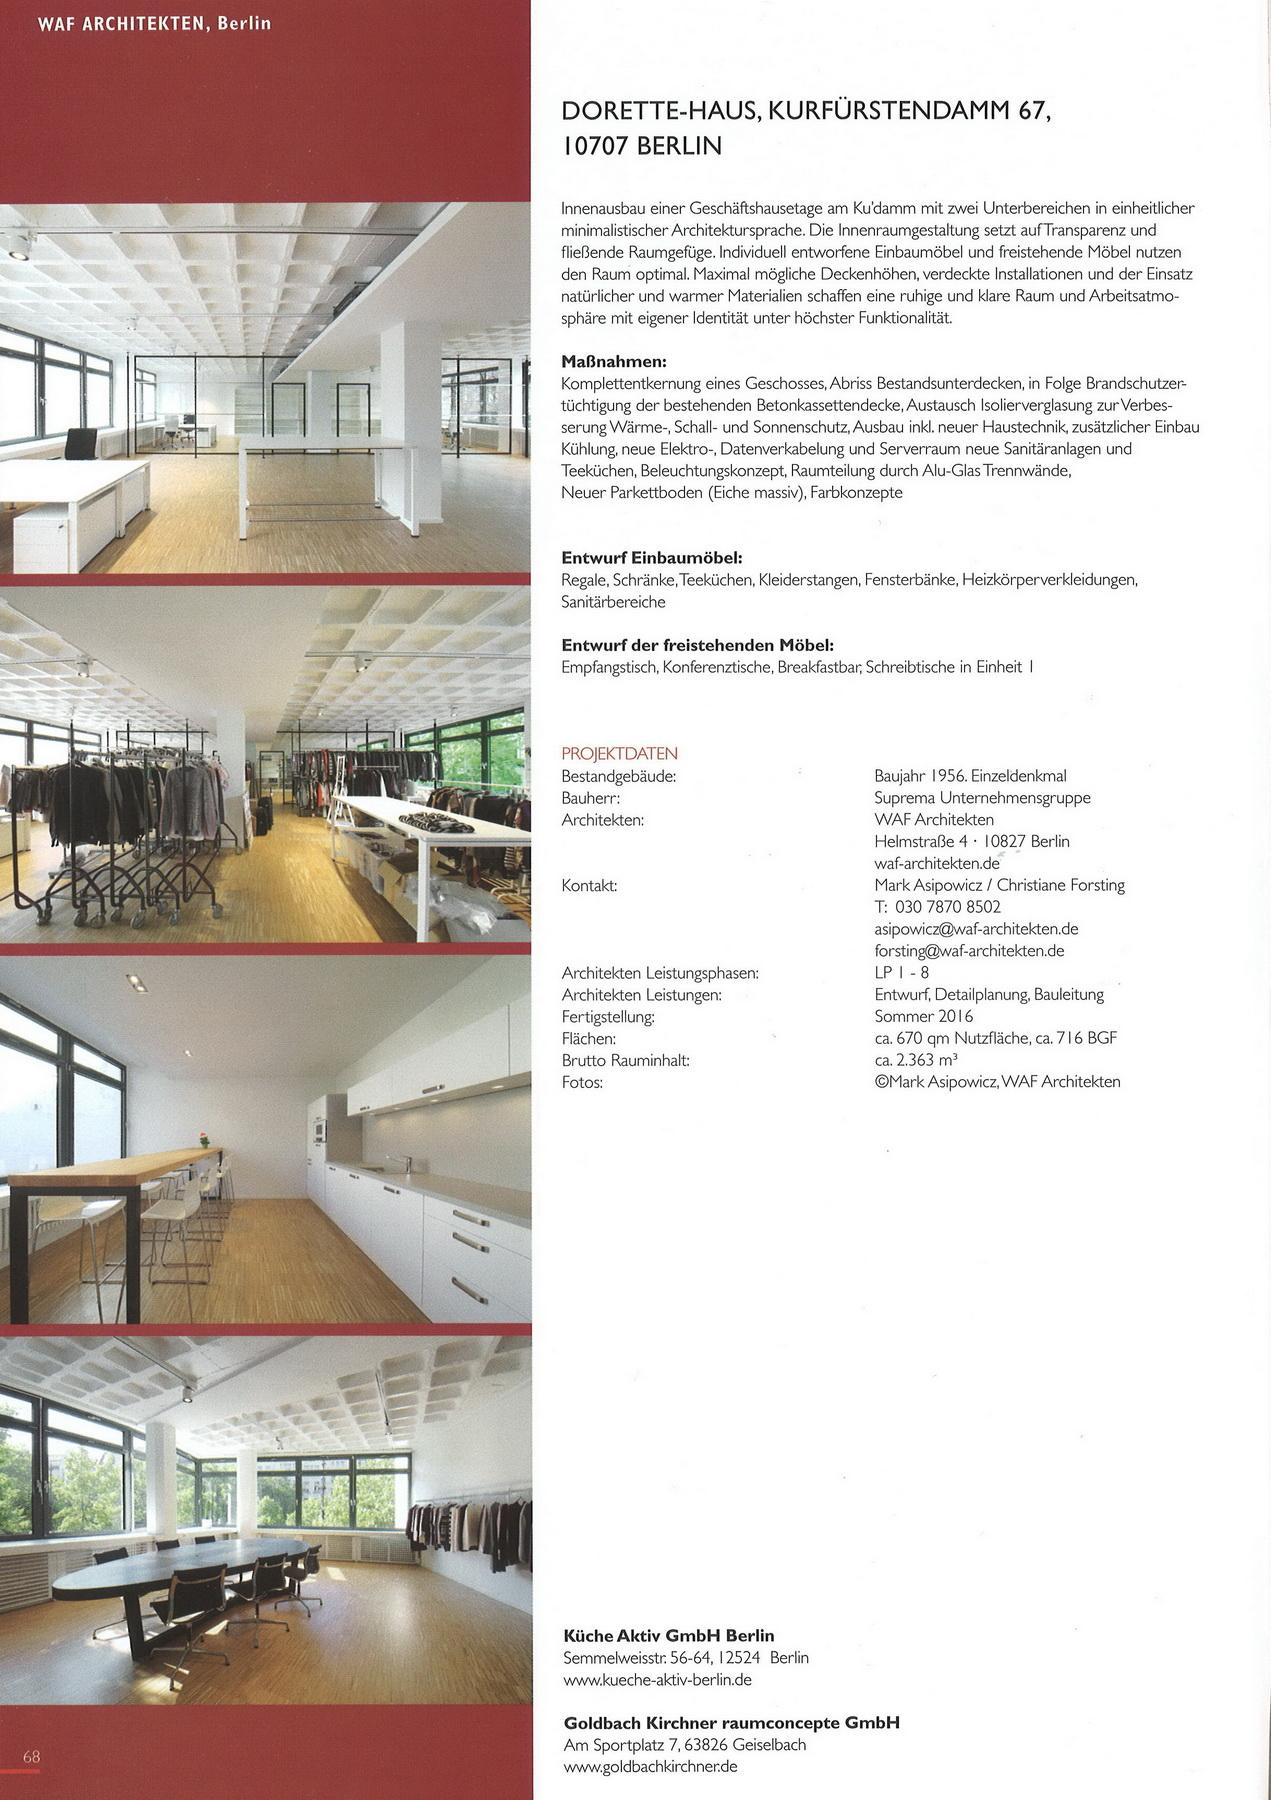 architektur berlin 2017 waf architekten. Black Bedroom Furniture Sets. Home Design Ideas